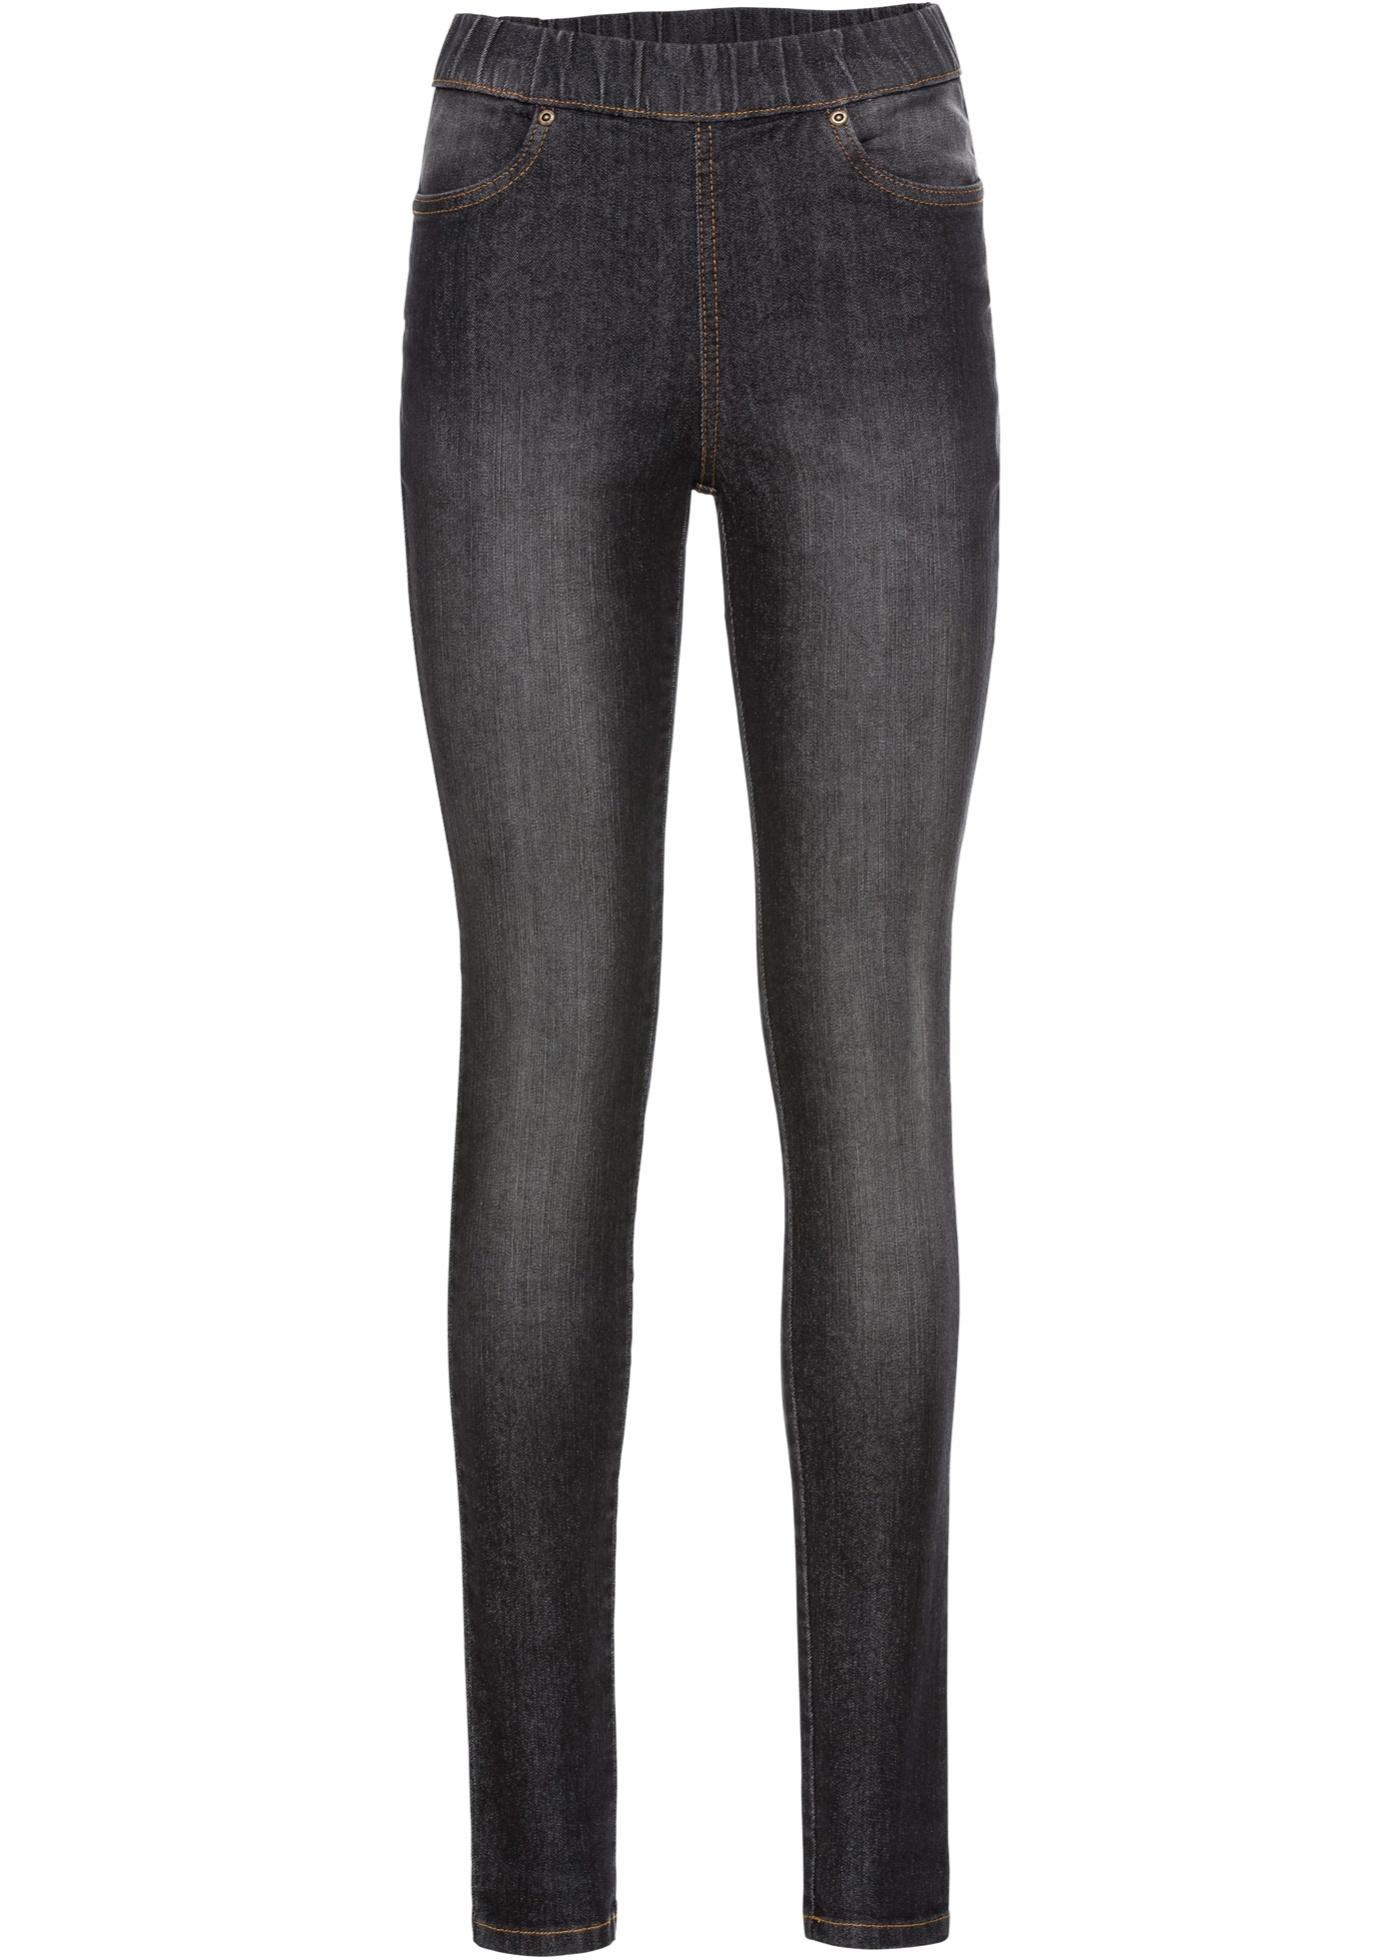 Femme Noir Confort John BonprixJegging stretch Jeanswear Baner Pour QxeWodBCEr